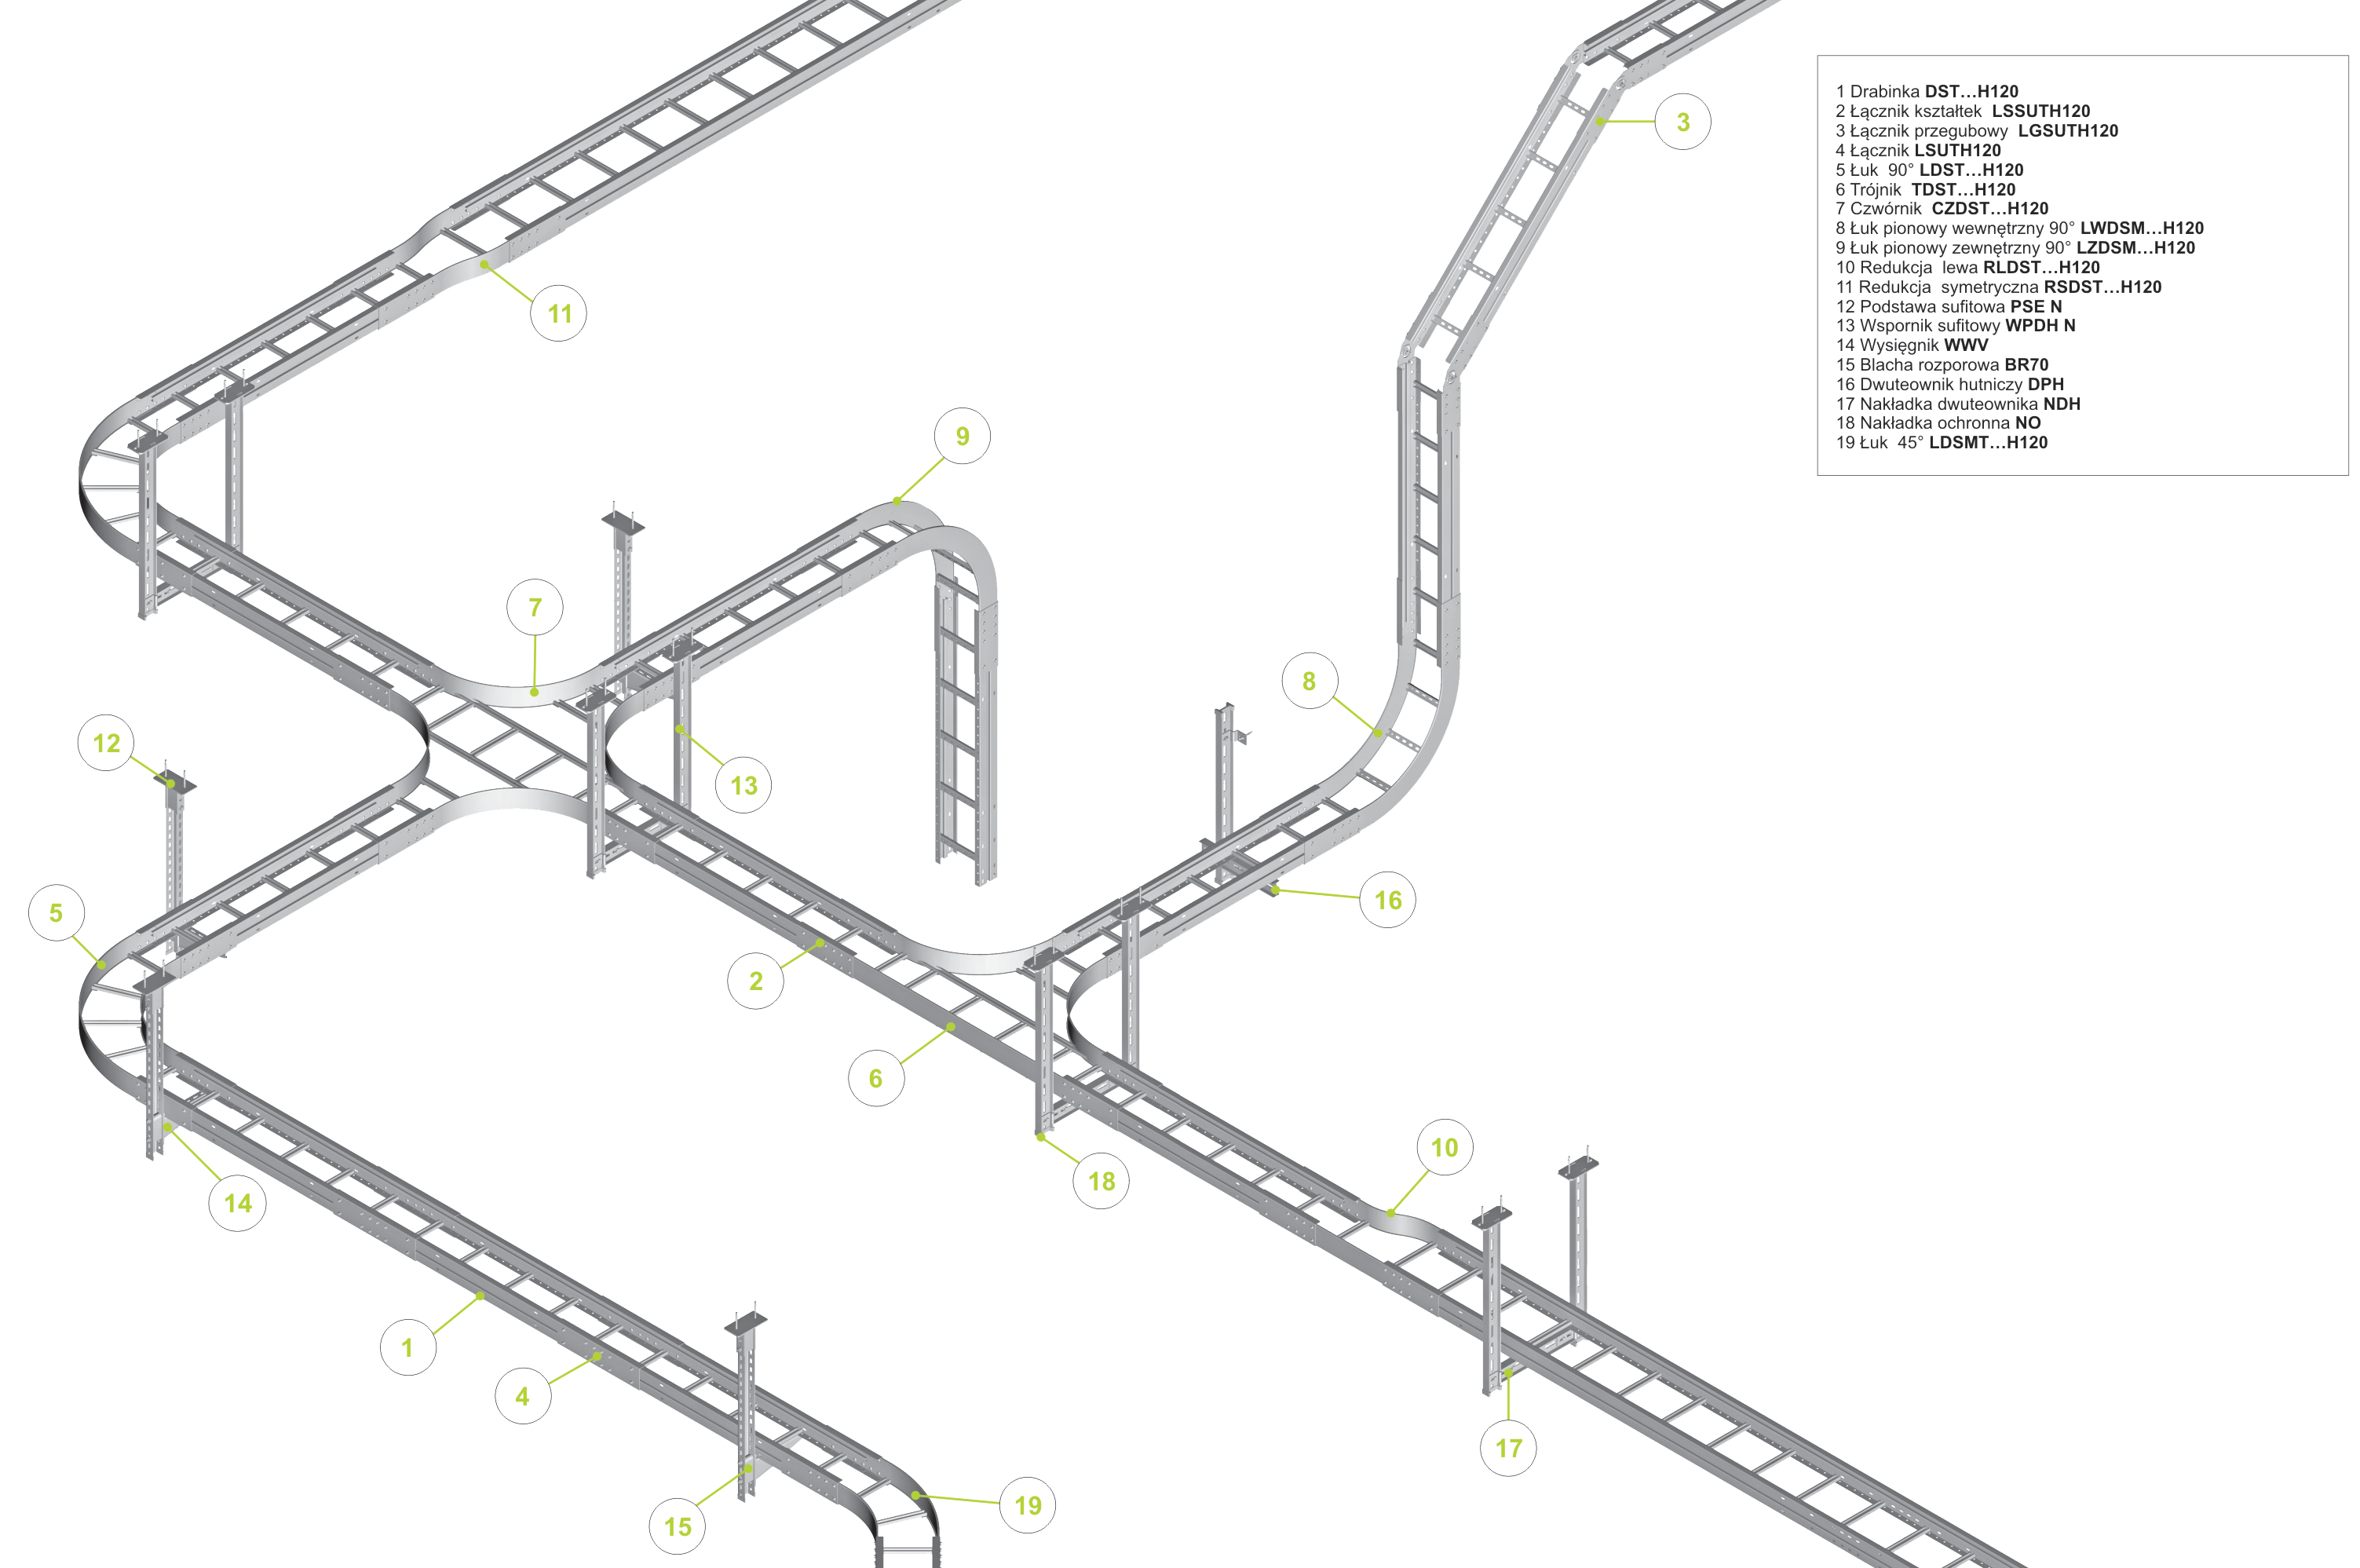 drabinki kablowe - system samonosny-mod